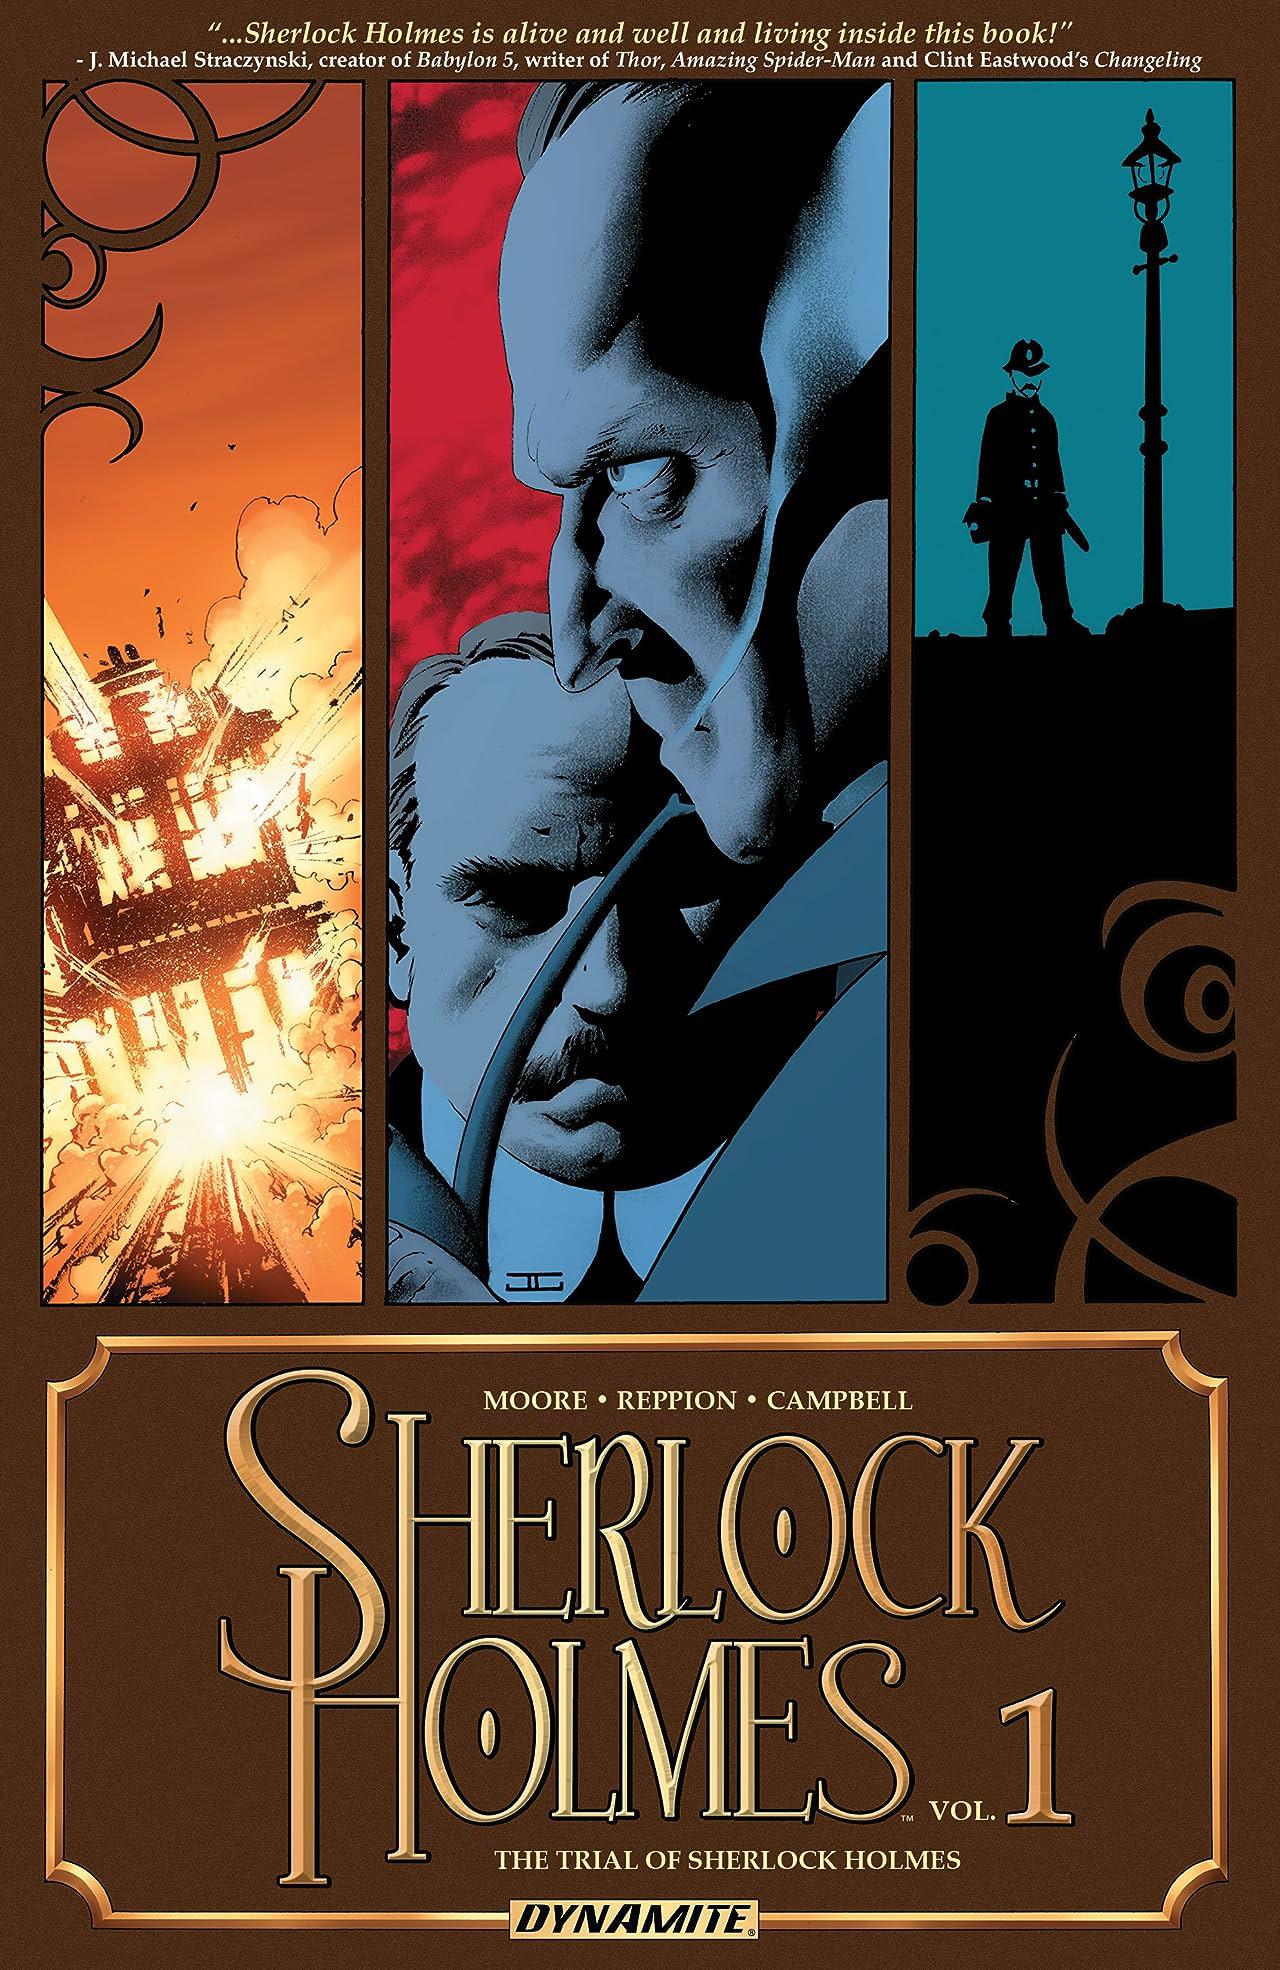 Sherlock Holmes Tome 1: The Trial of Sherlock Holmes